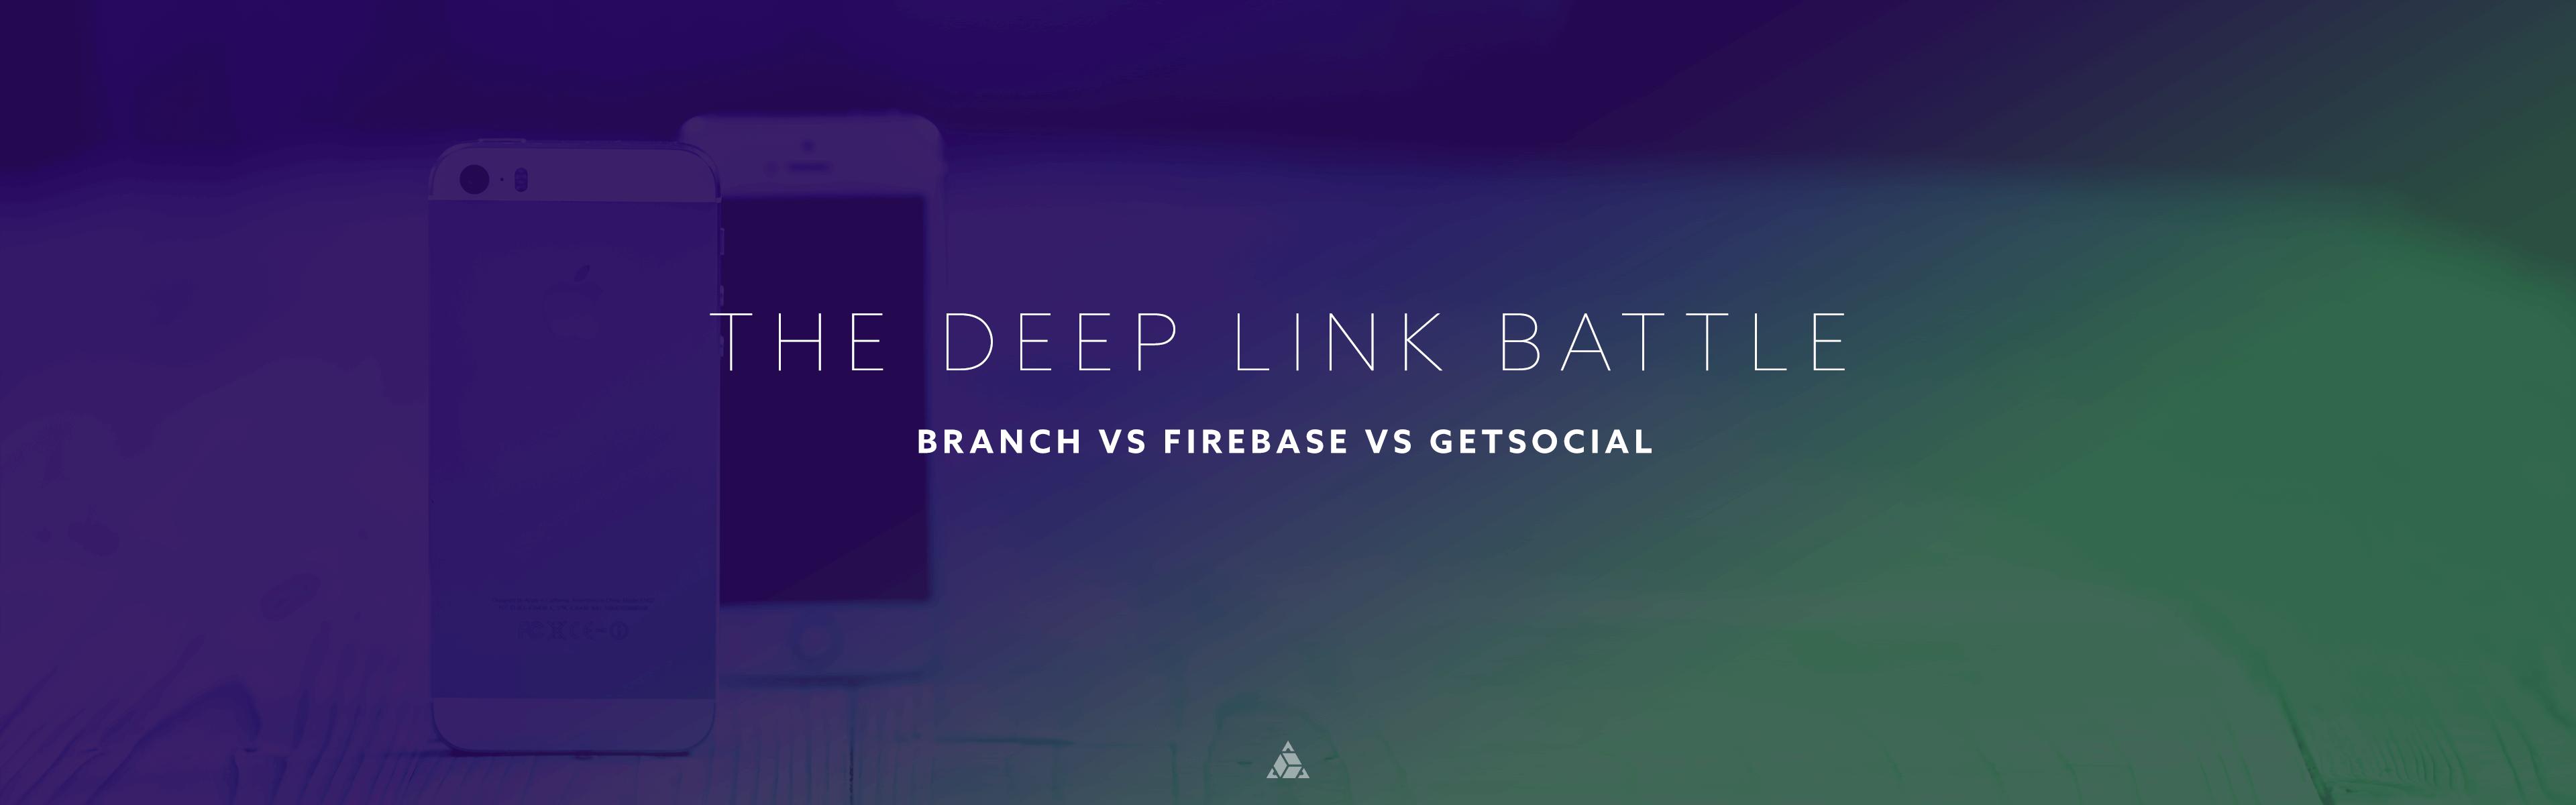 The Deep Link Battle: Branch vs Firebase vs GetSocial